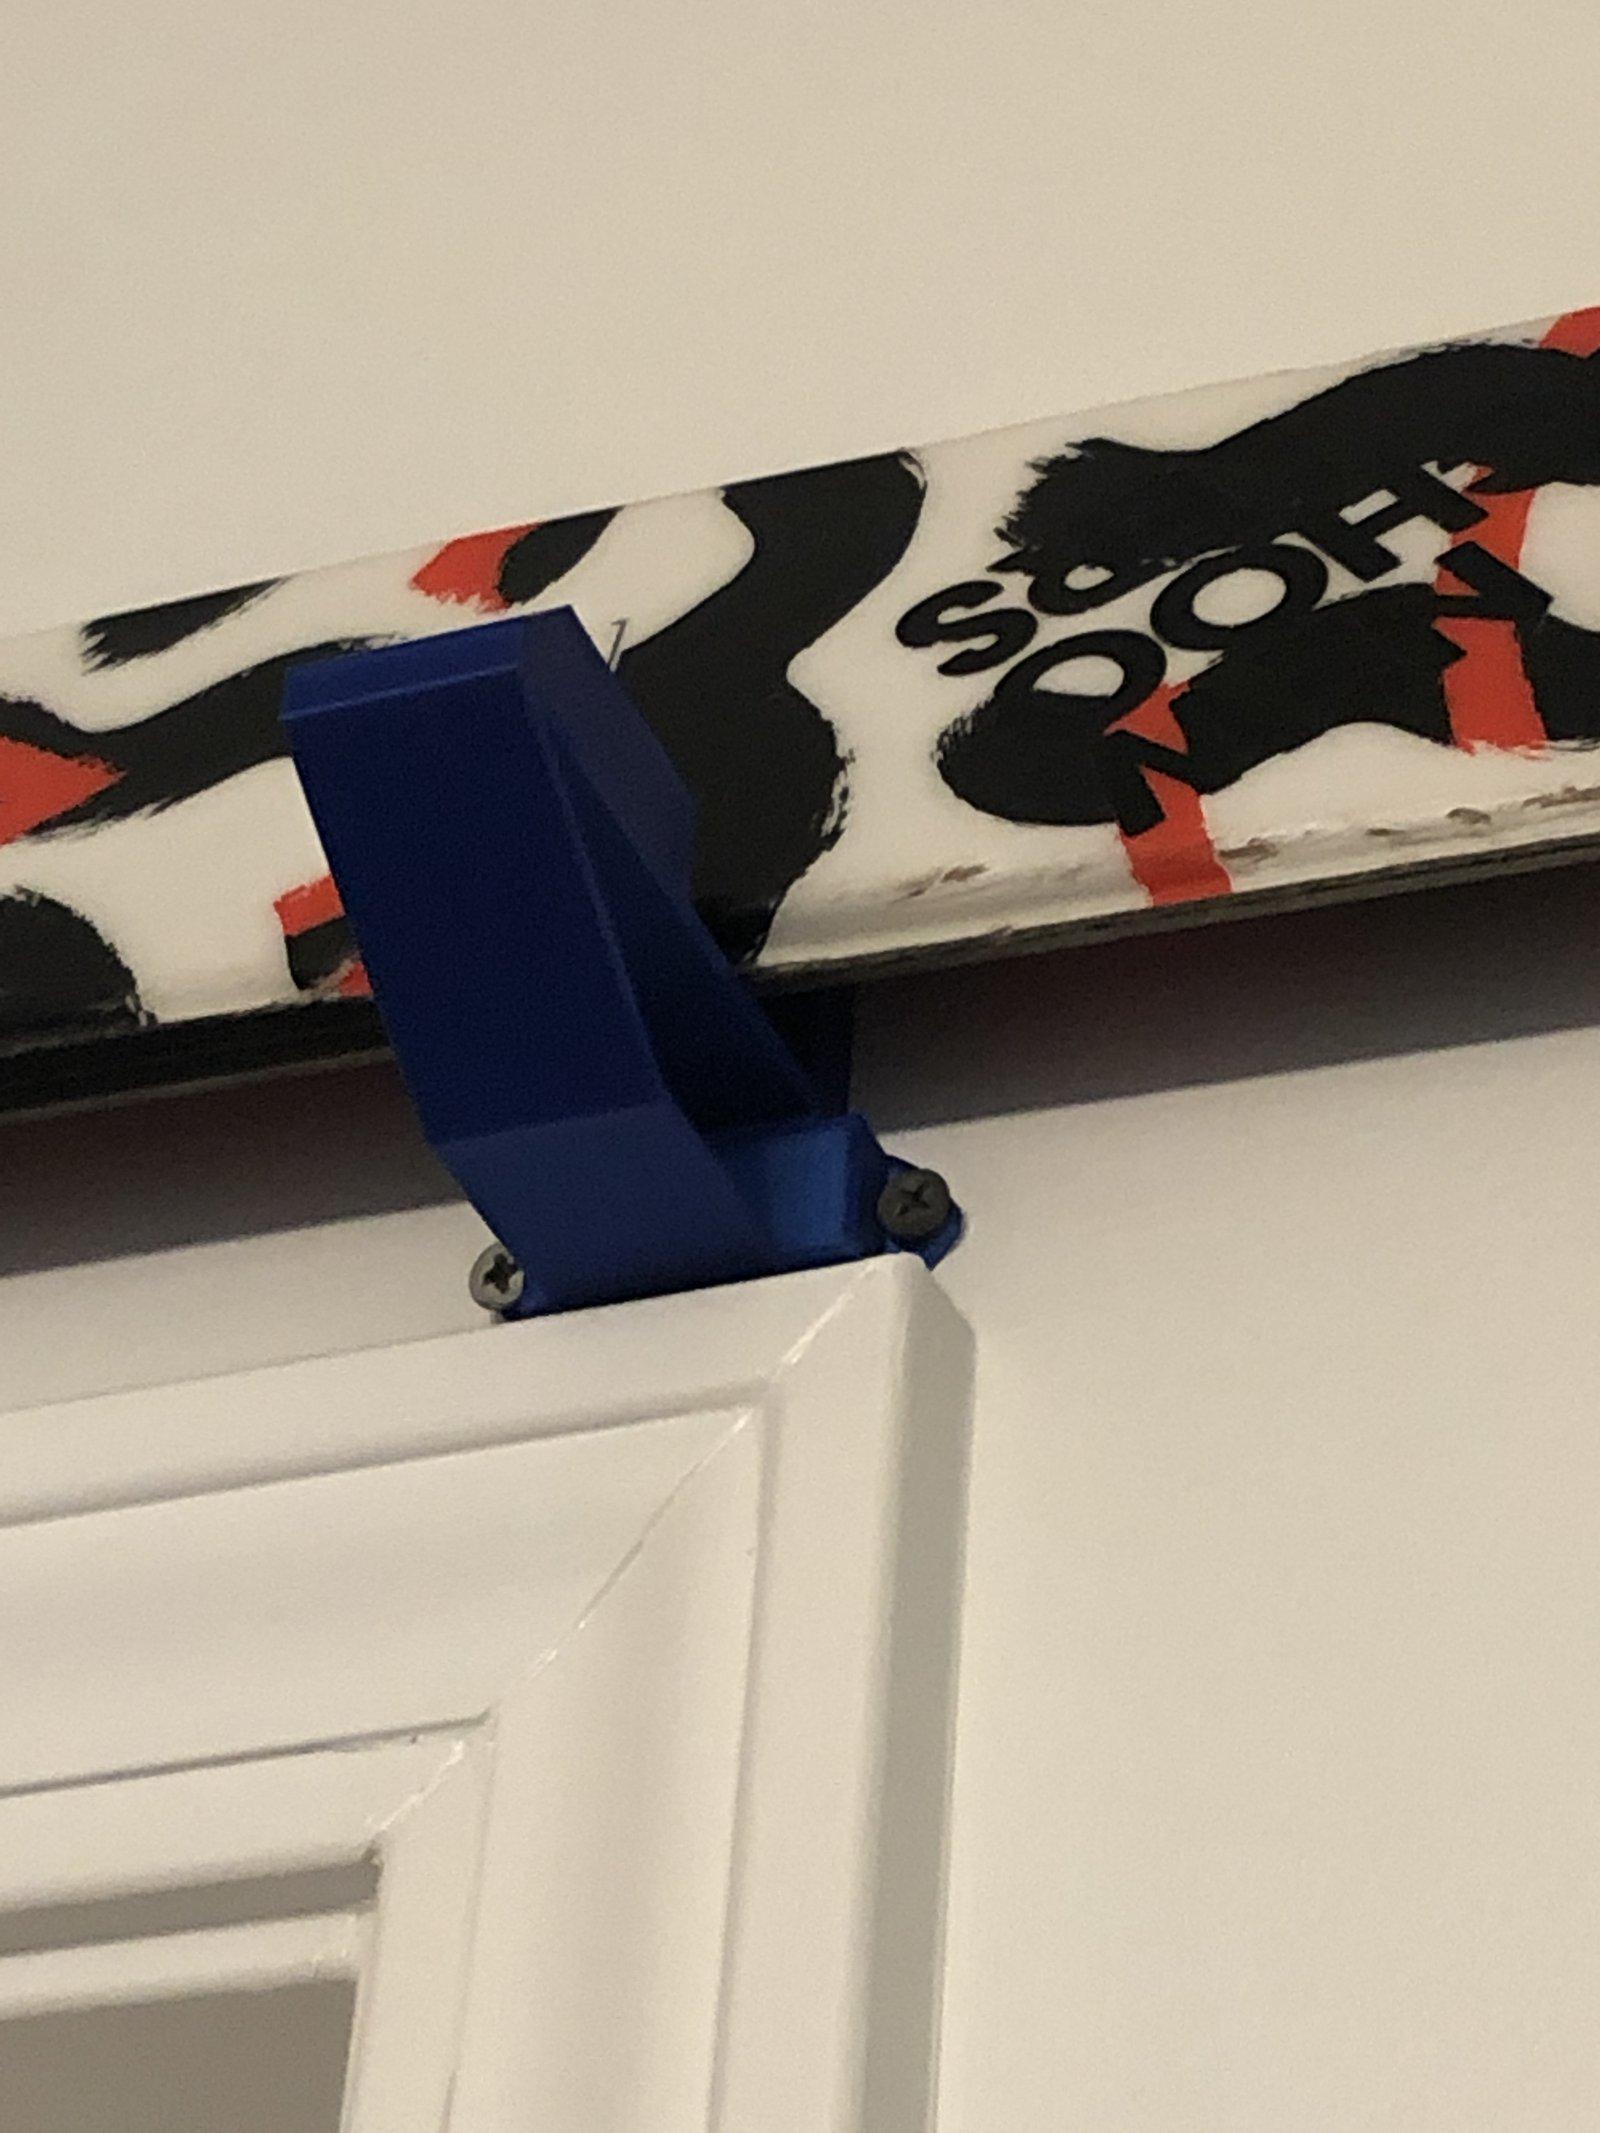 3D printed shelf